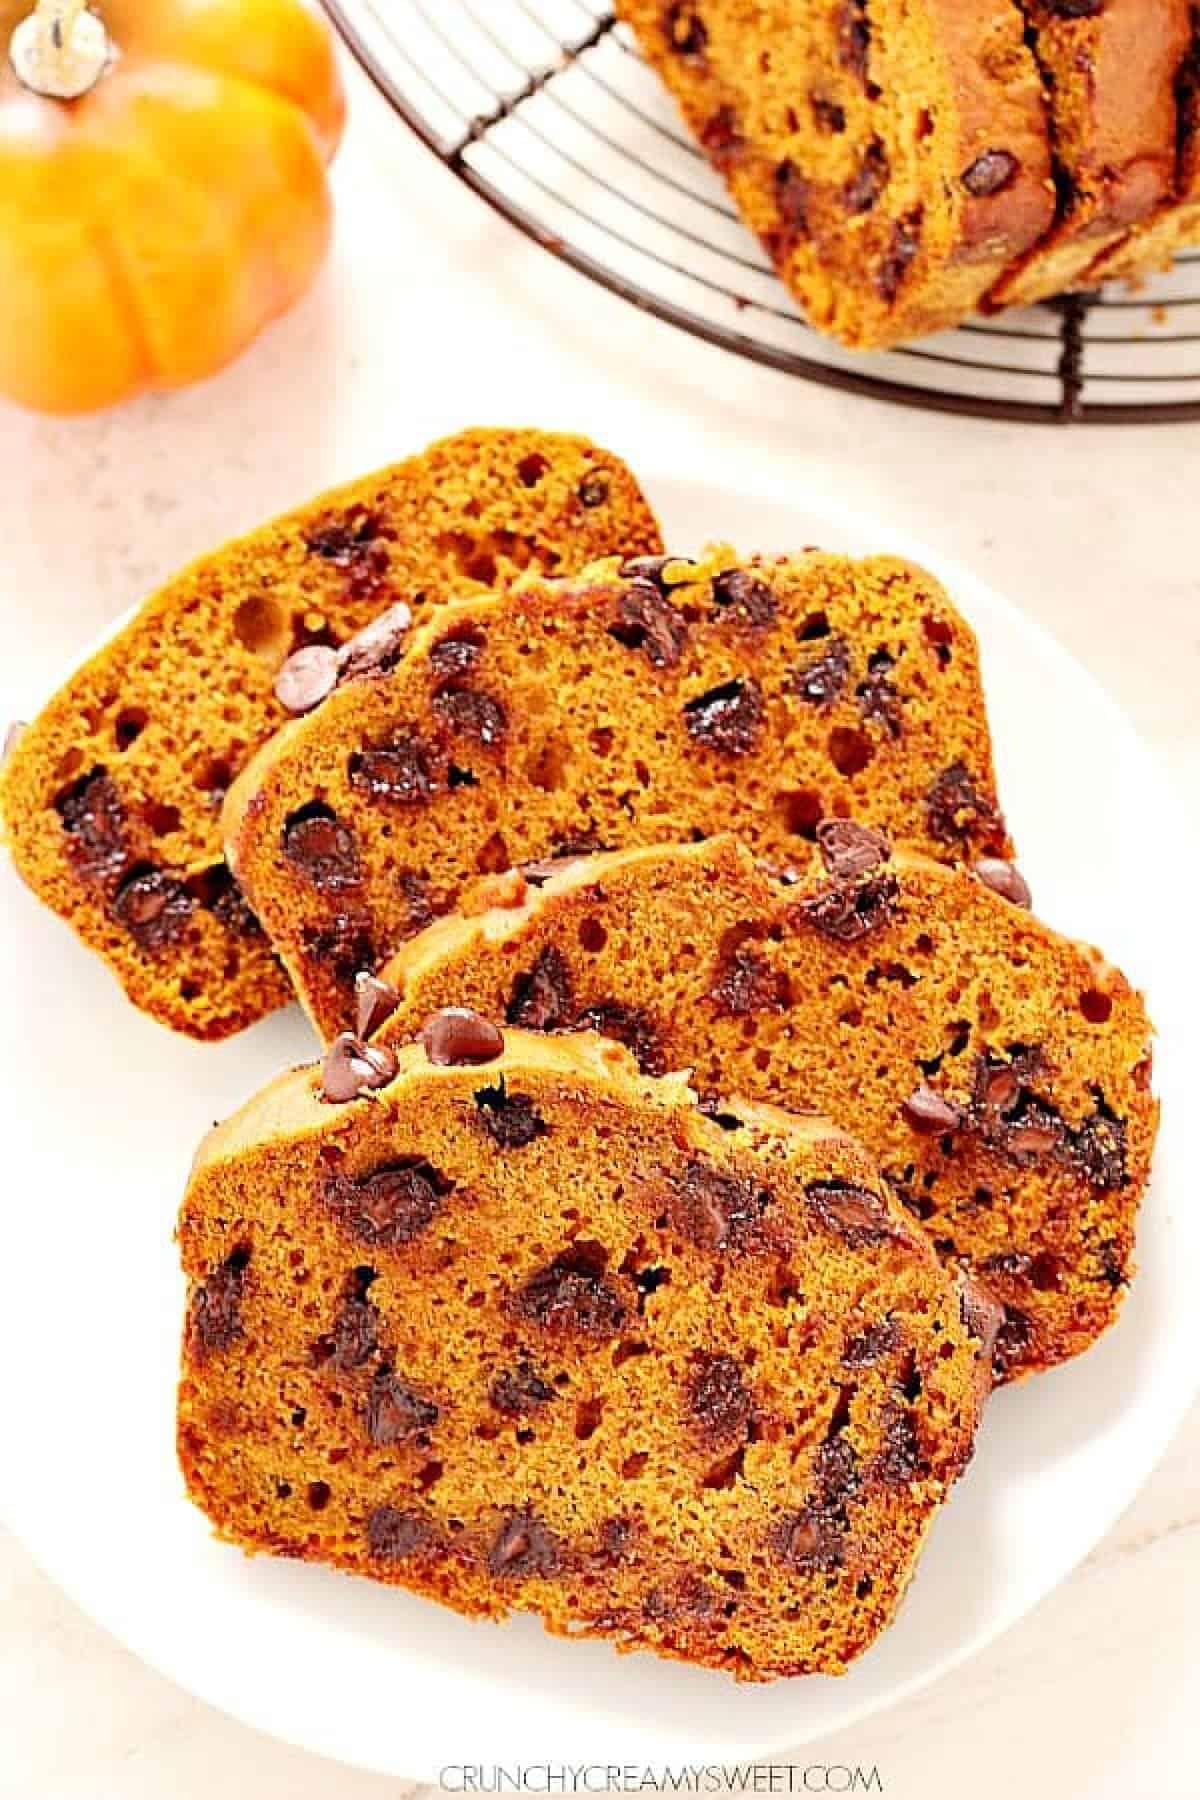 pumpkin bread 2 Pumpkin Chocolate Chip Bread